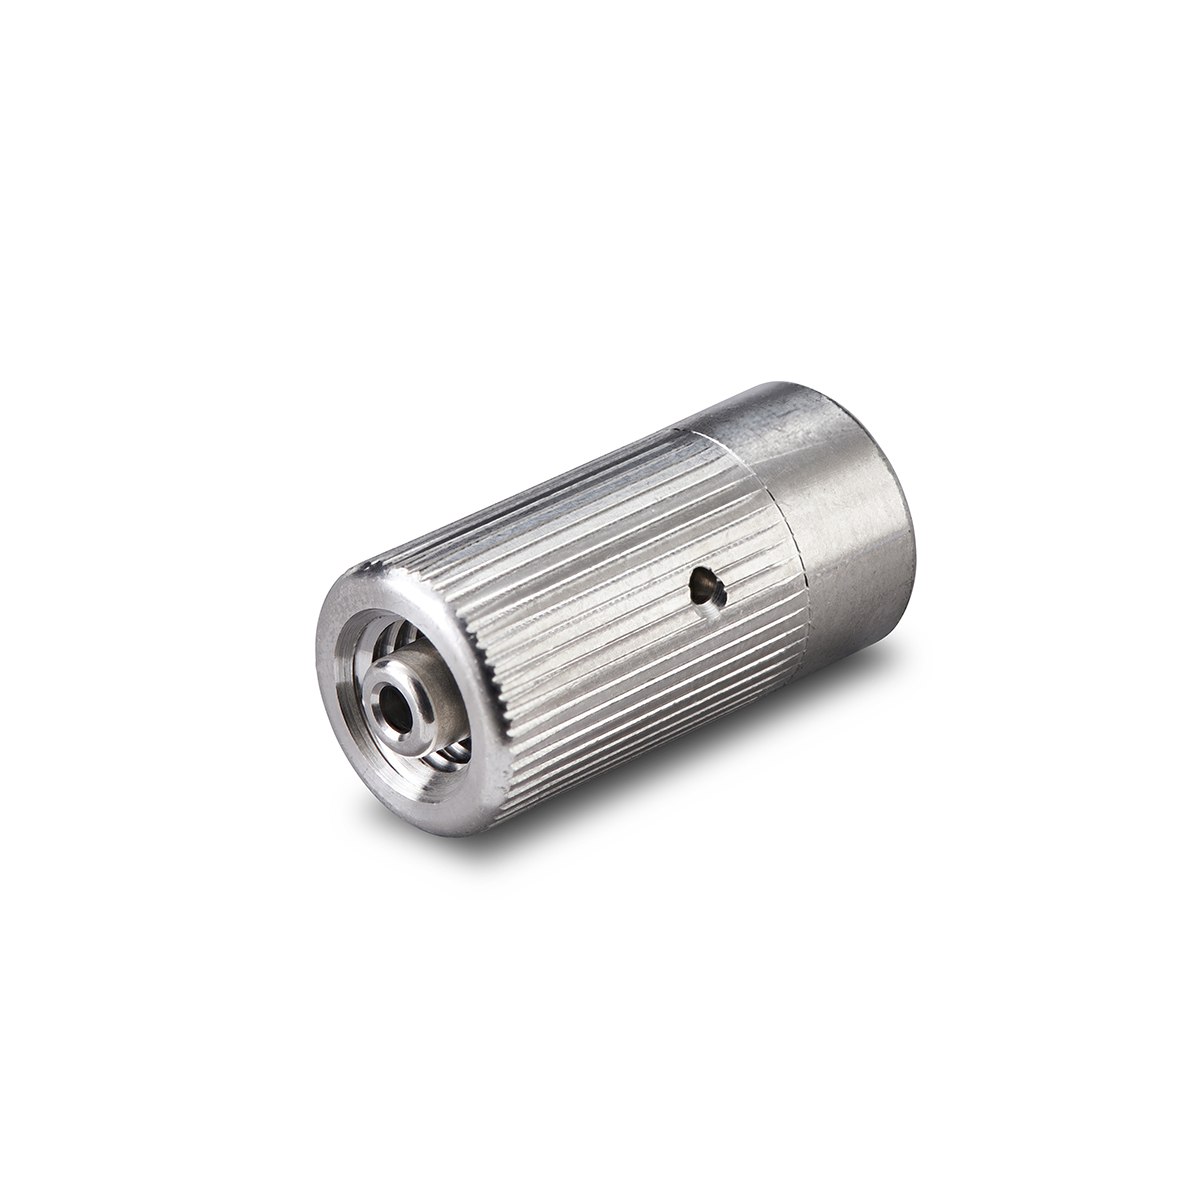 STOPCON Tubing Adapter Image